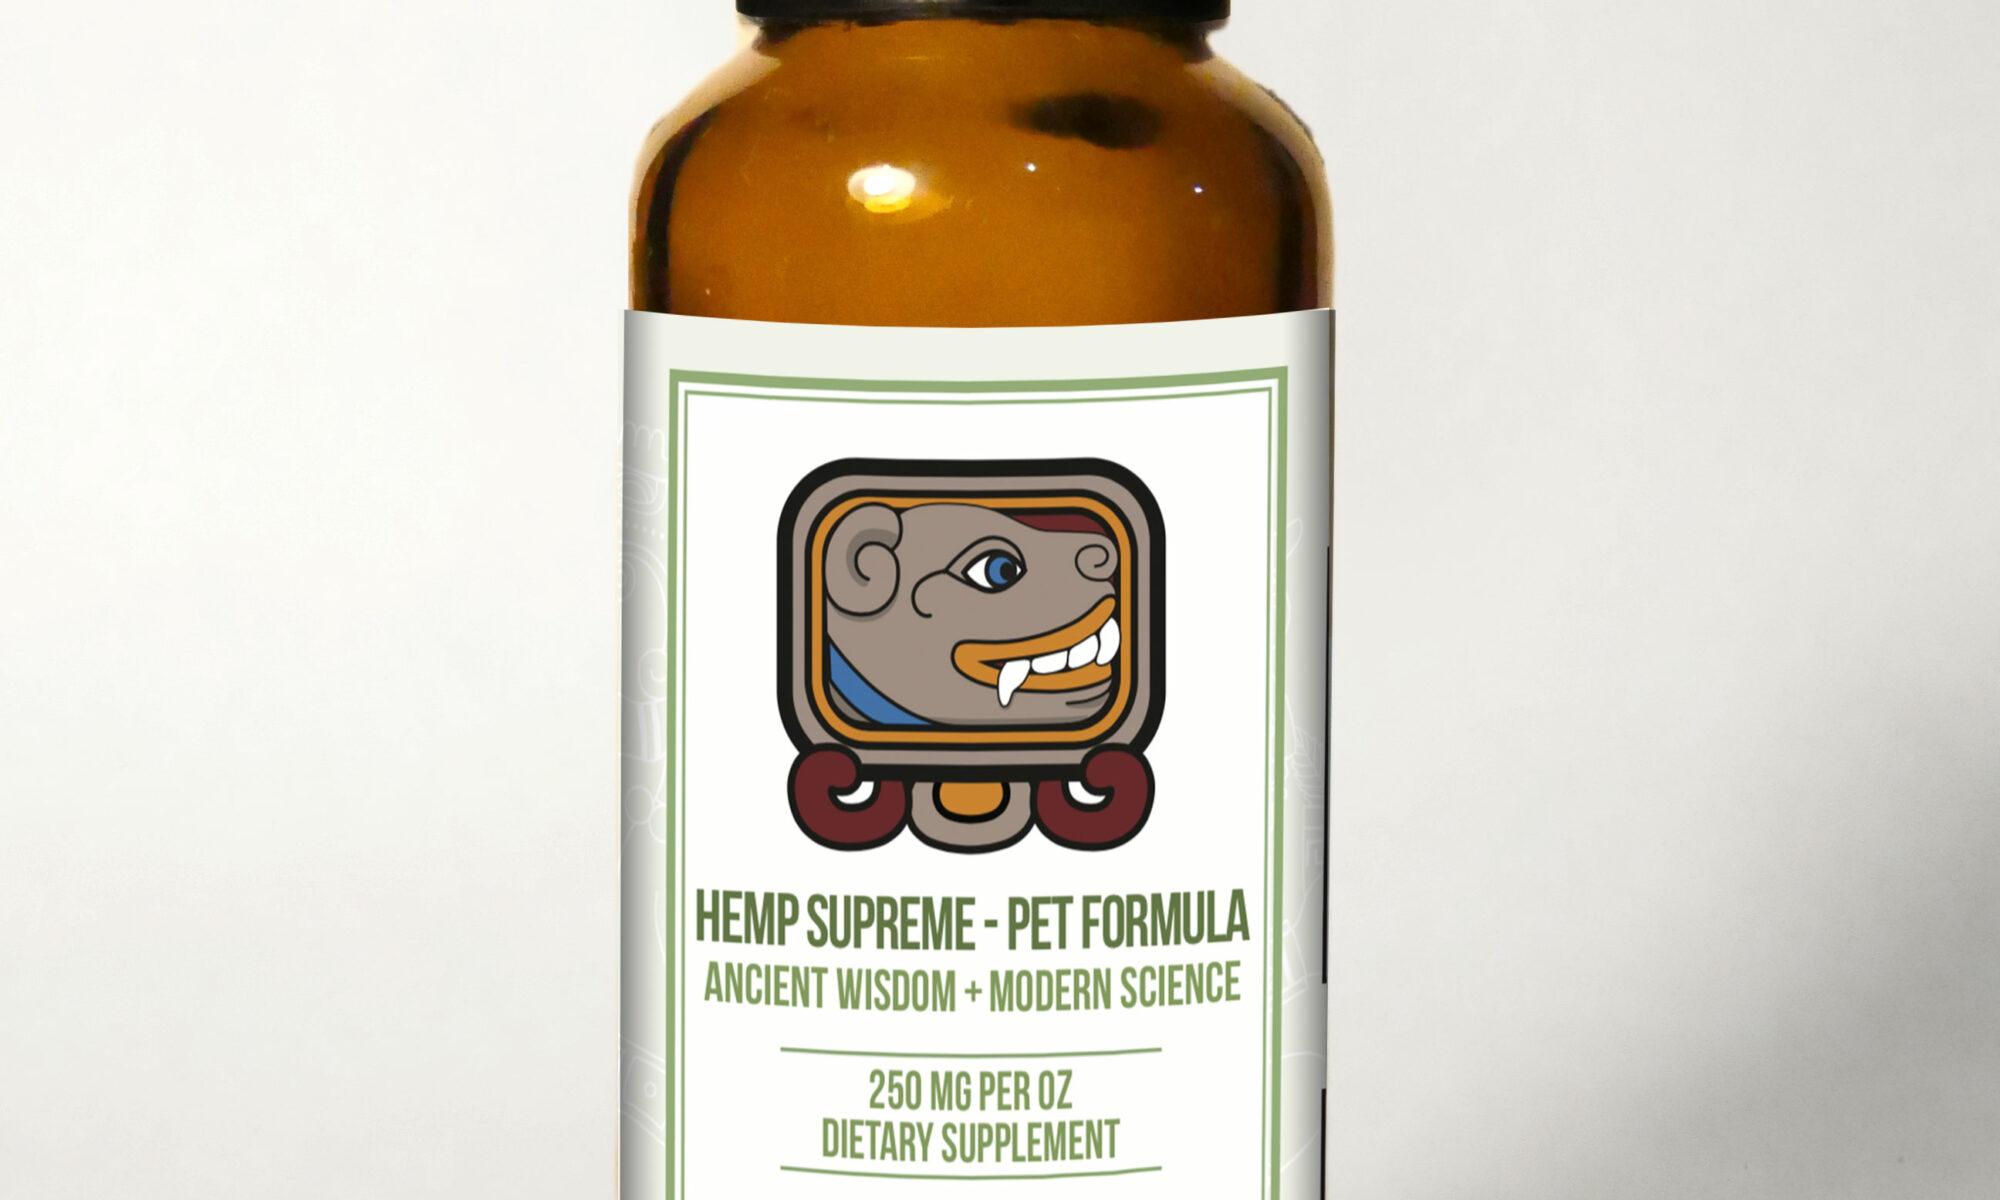 Pet Bottle withBG 2000x1200 - Hemp Supreme Full Spectrum Oil - Pet Formula (250 mg CBD per 30 ml.)